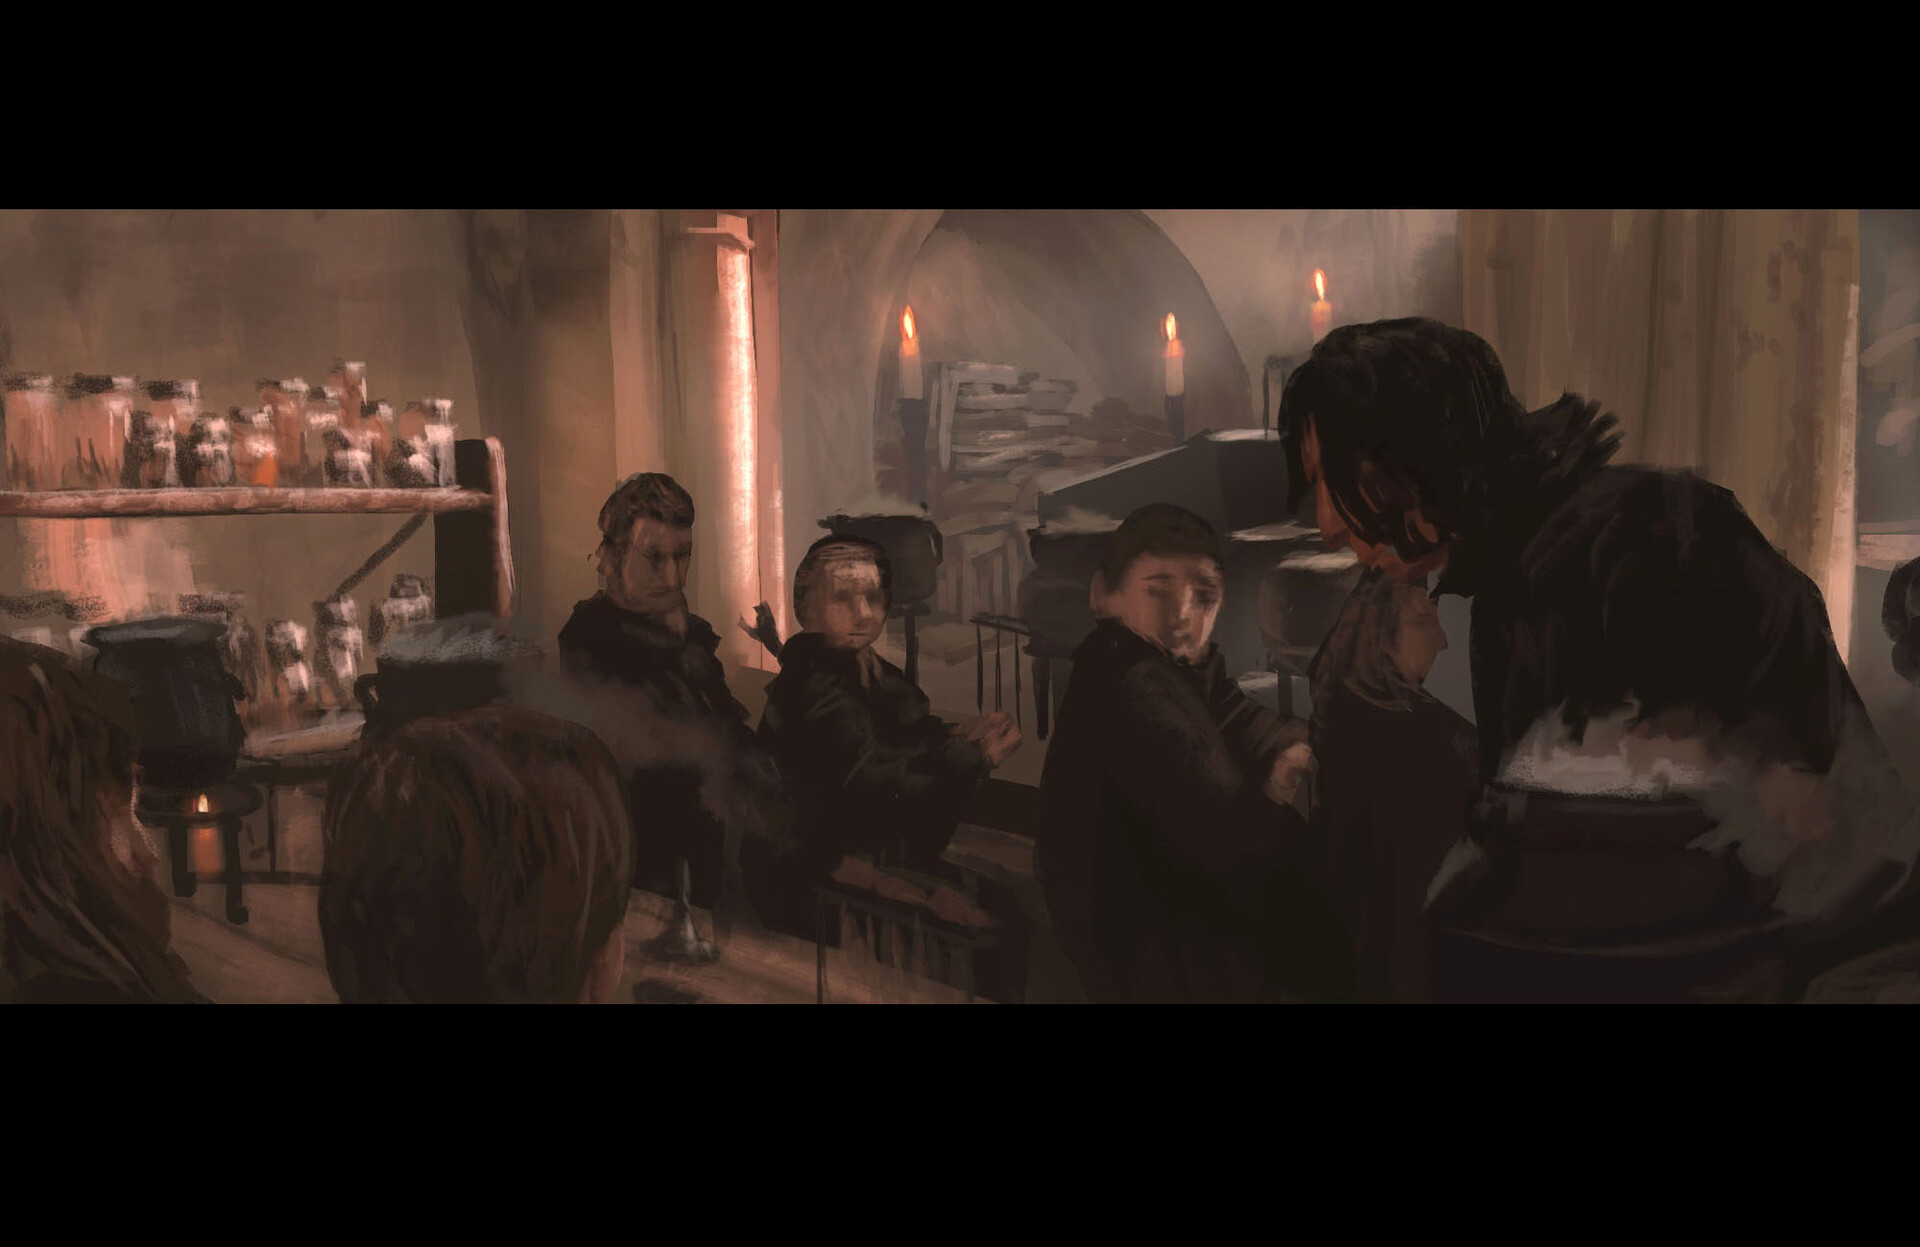 Harry Potter 01 // Study / Lighting / Color (90-120 min)